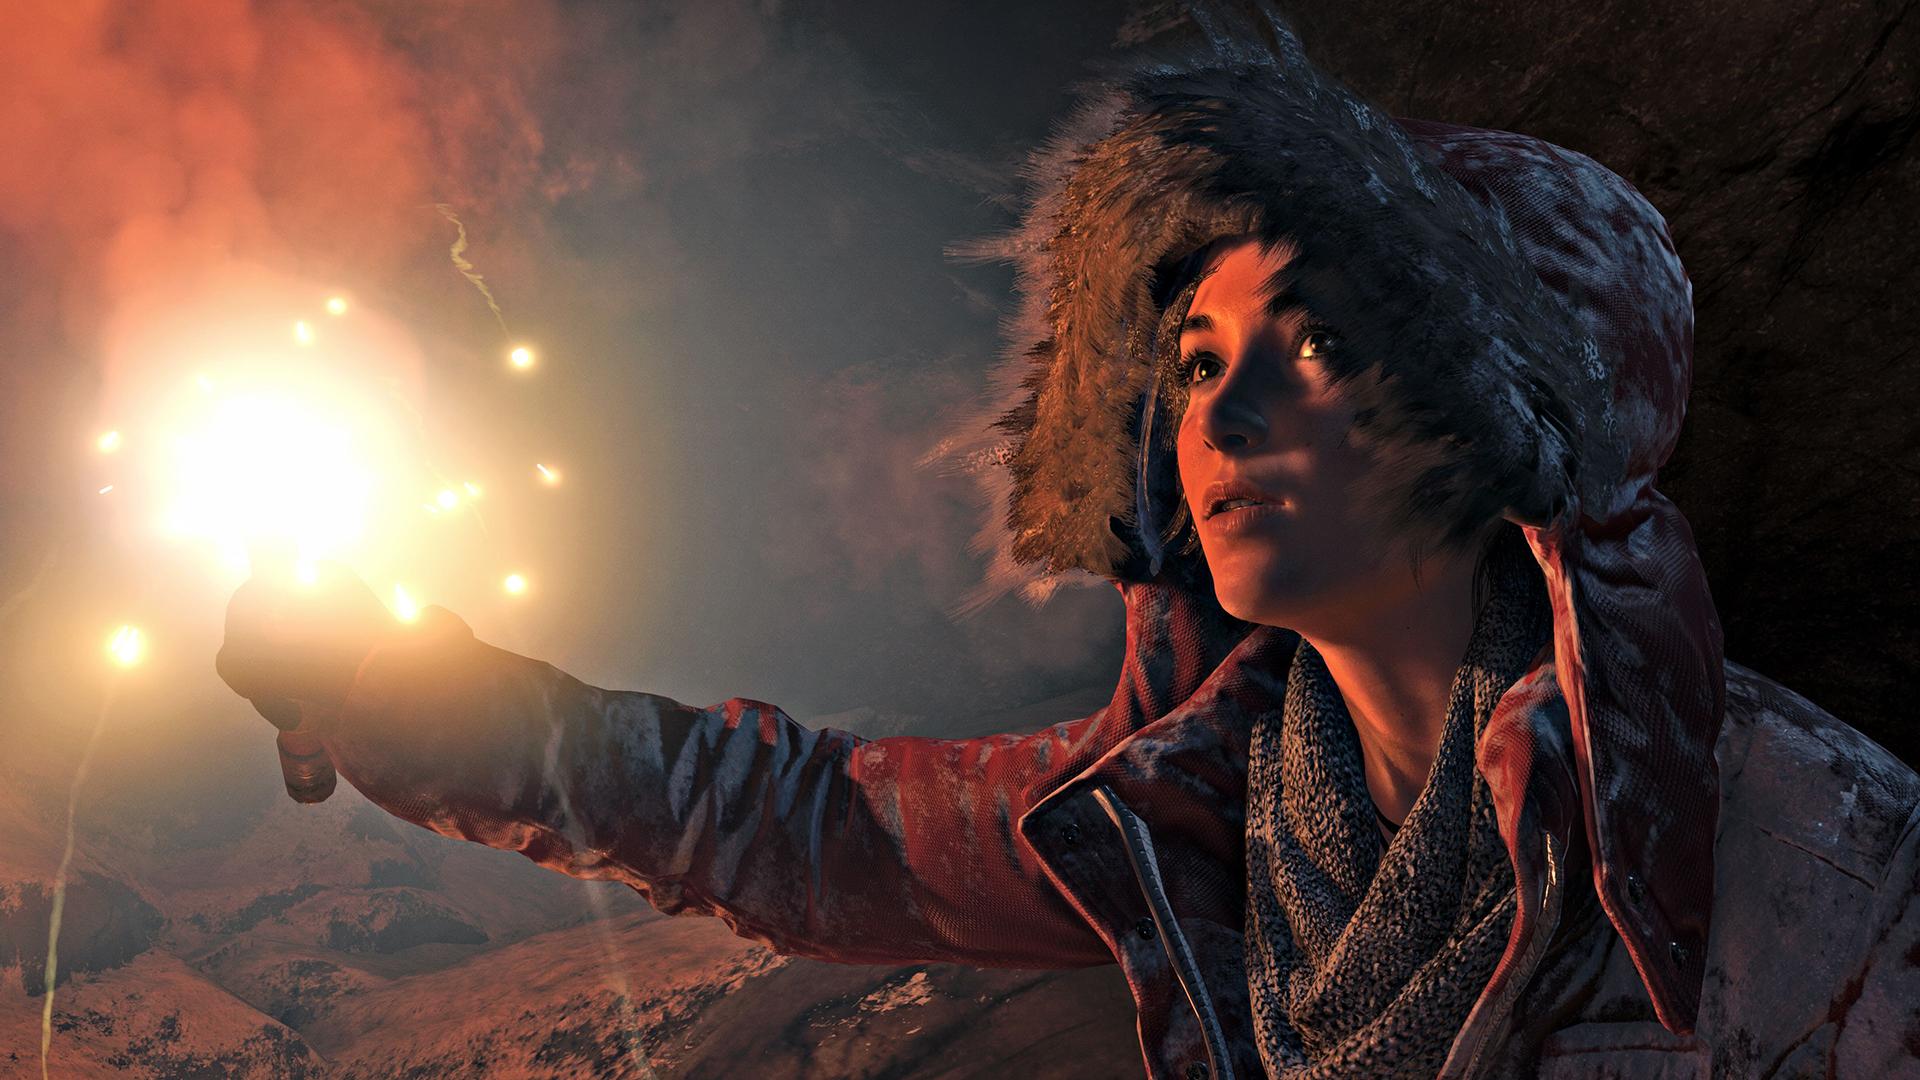 rottr_HNSLiqB Rise of the Tomb Raider Oynanış Videosu